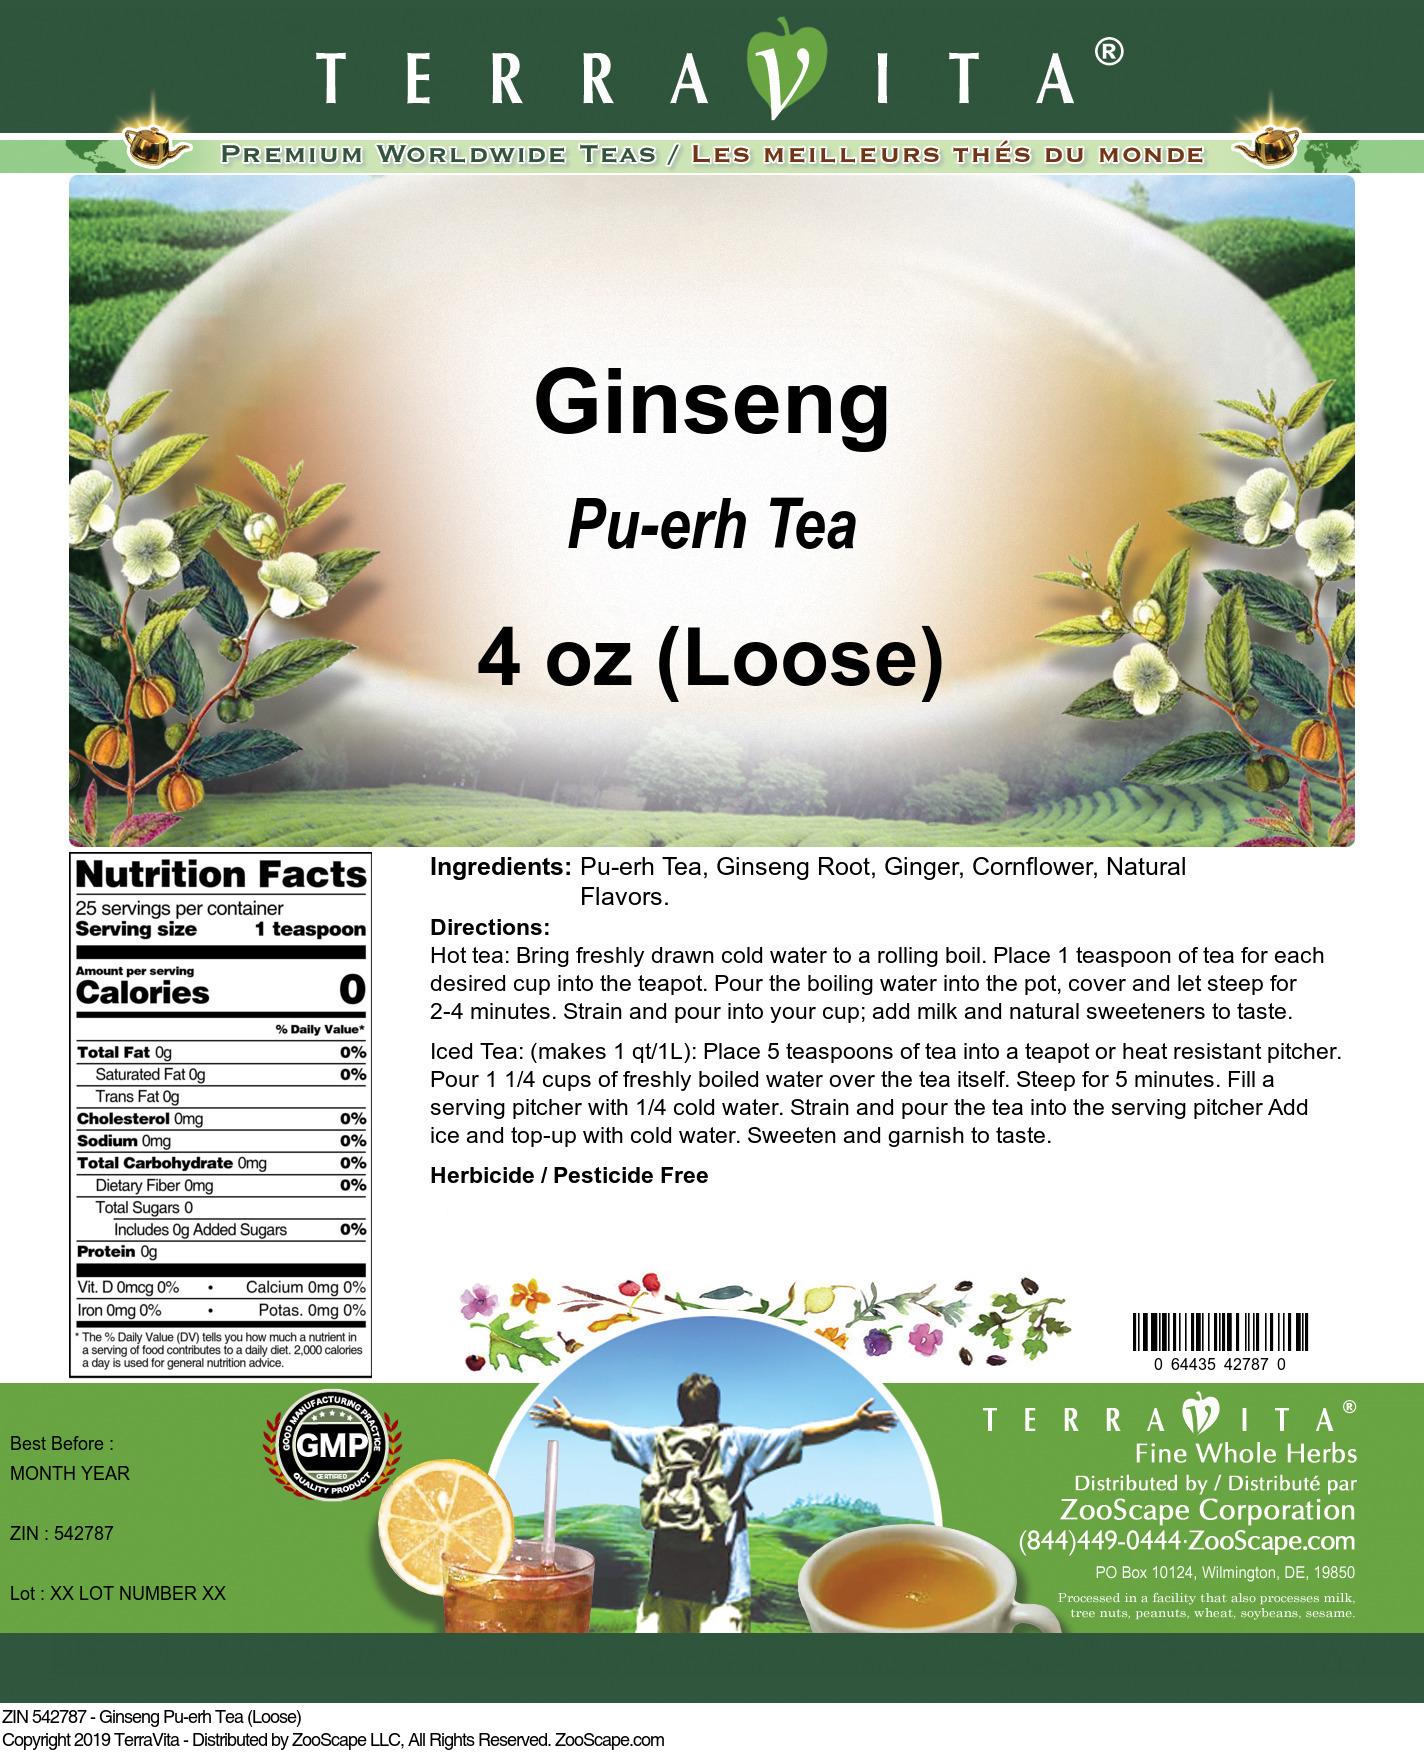 Ginseng Pu-erh Tea (Loose)